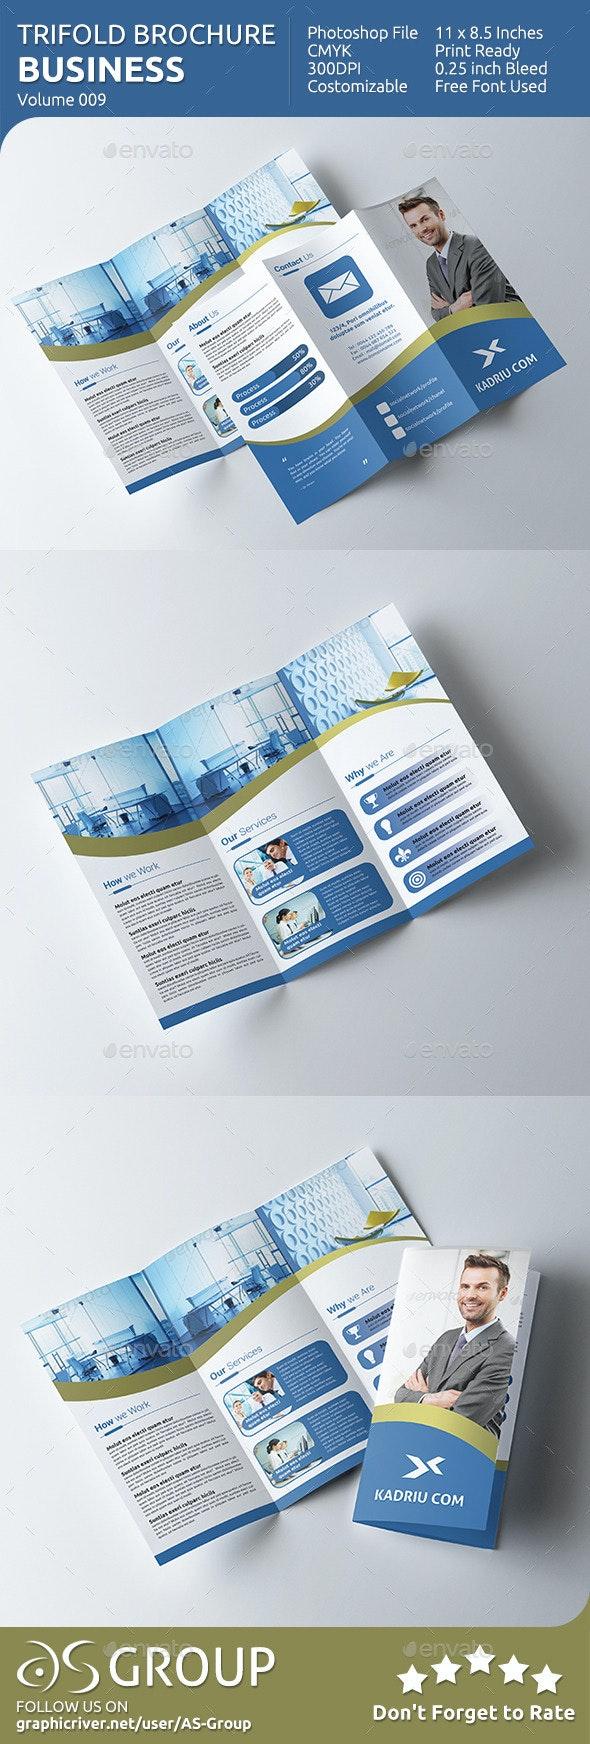 Business Tri-fold Brochure - v009 - Brochures Print Templates